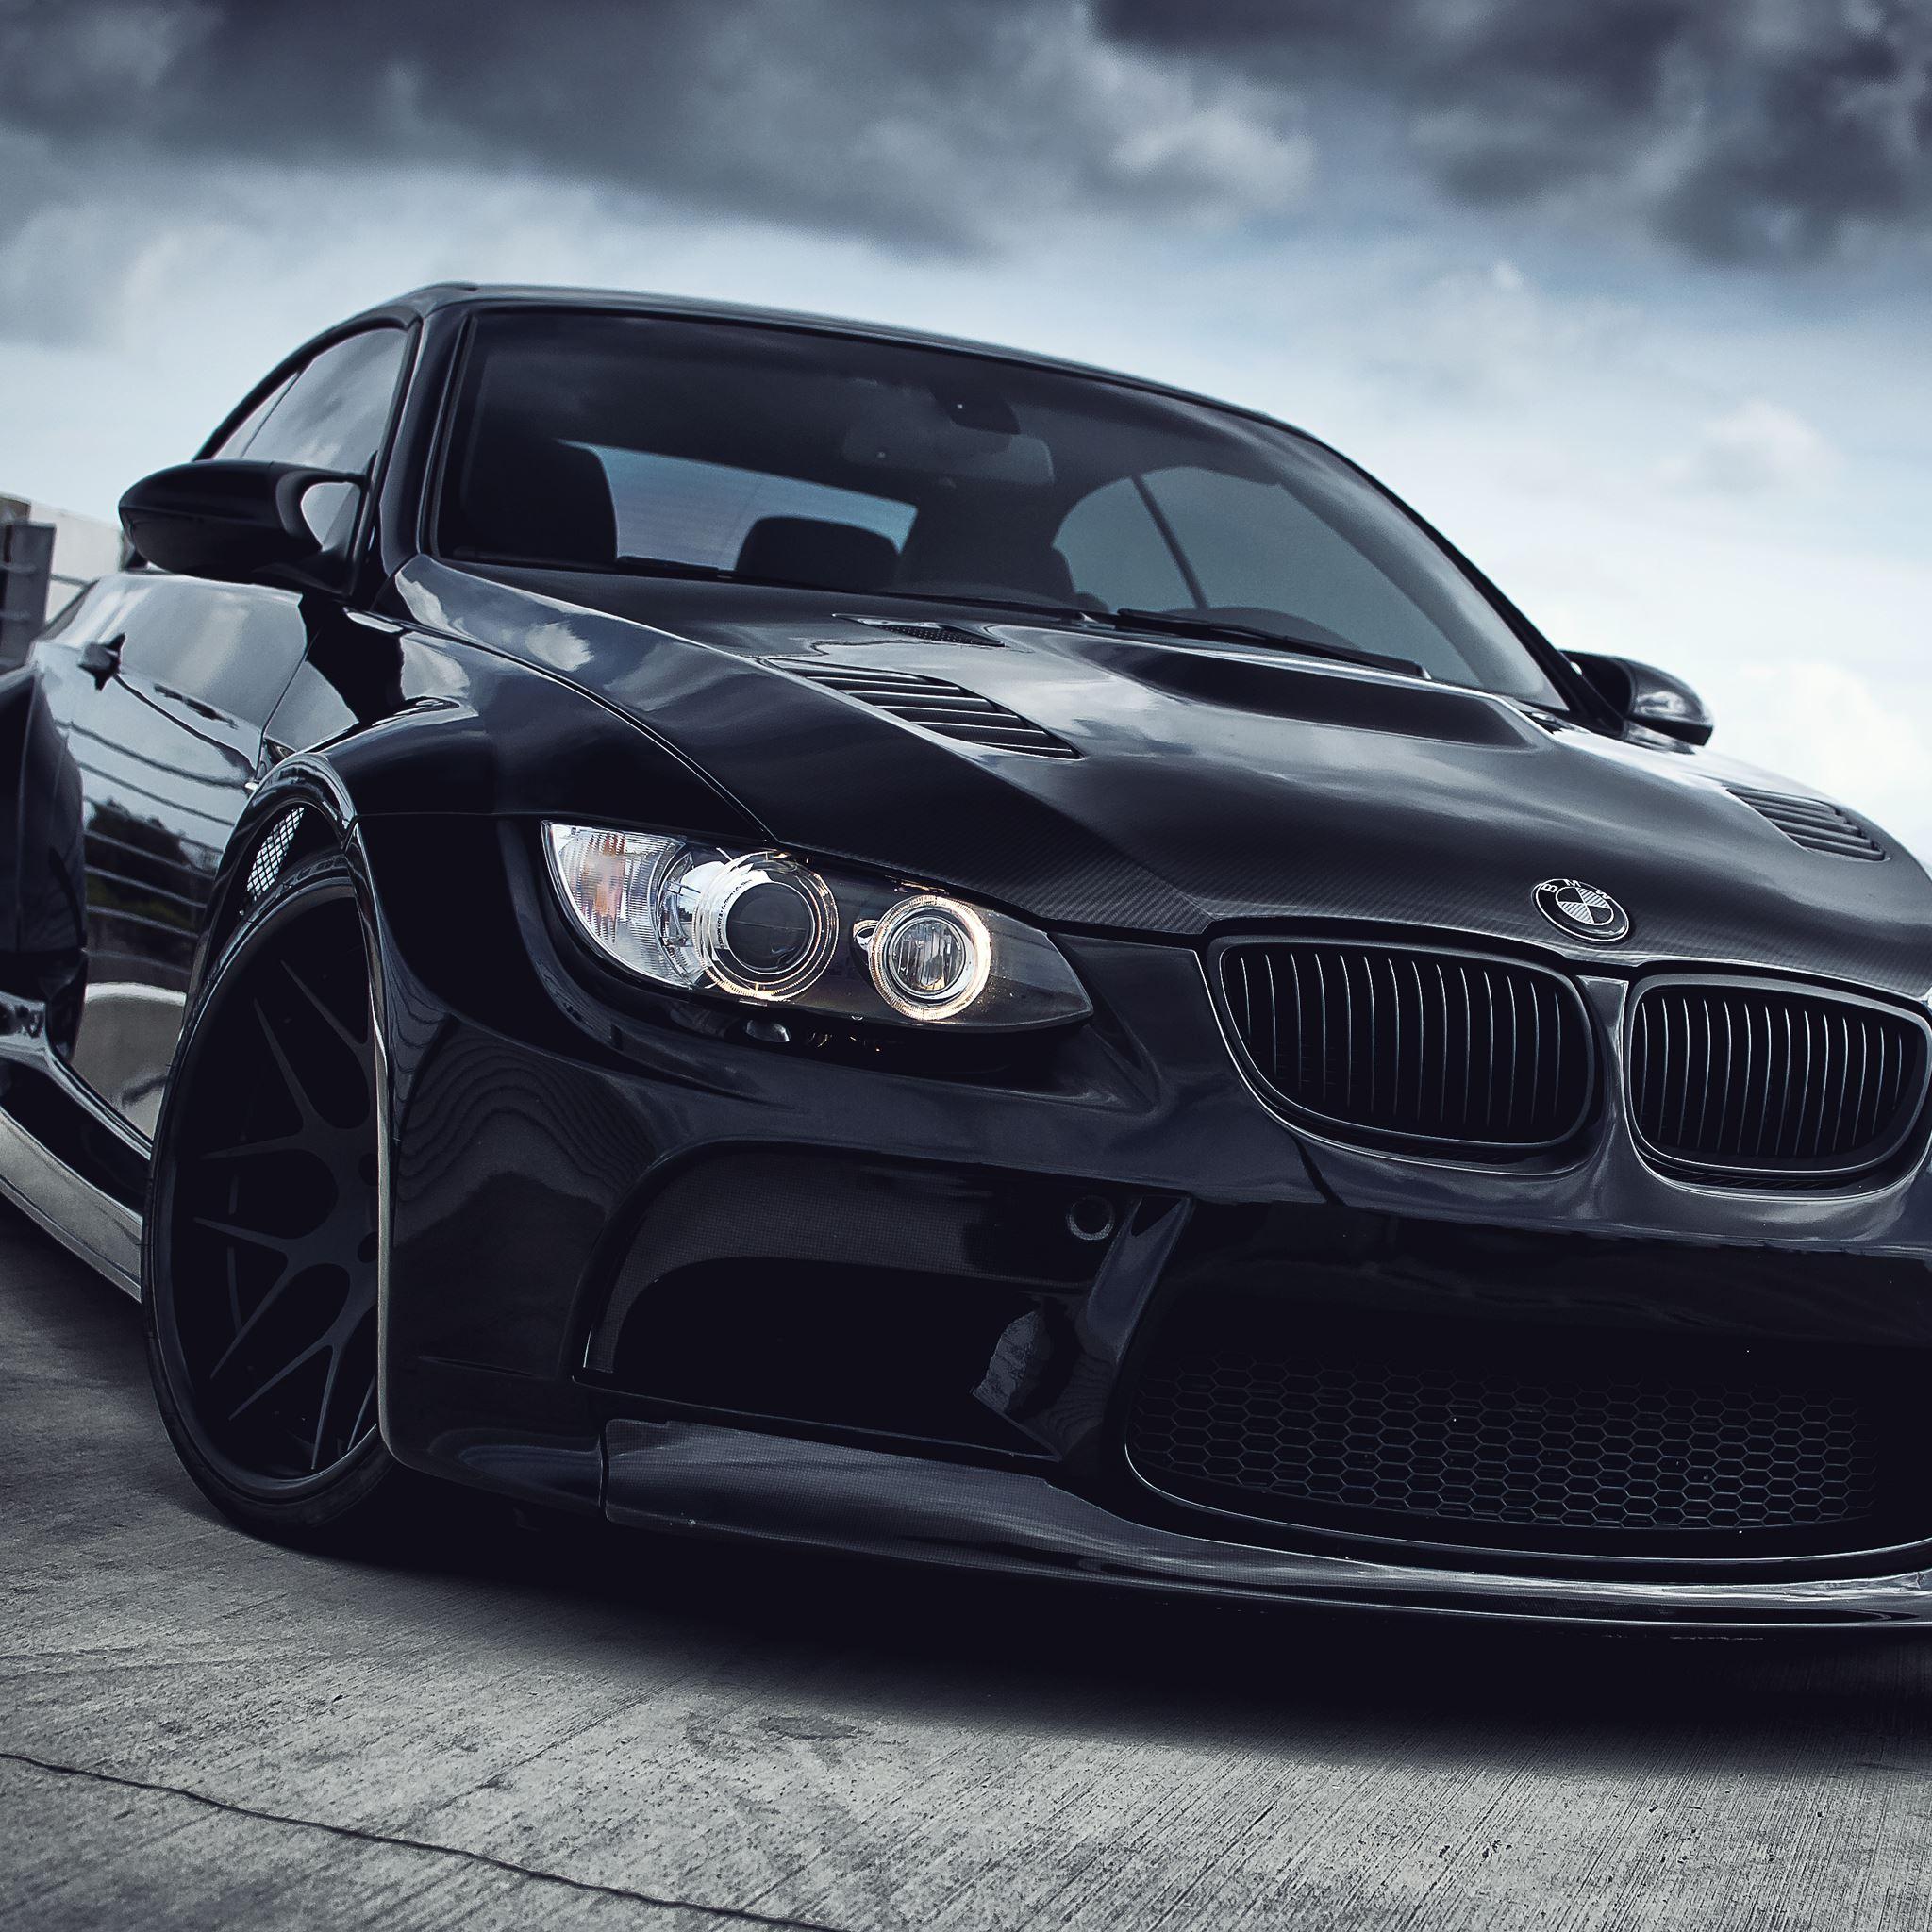 BMW IPad Air Wallpaper